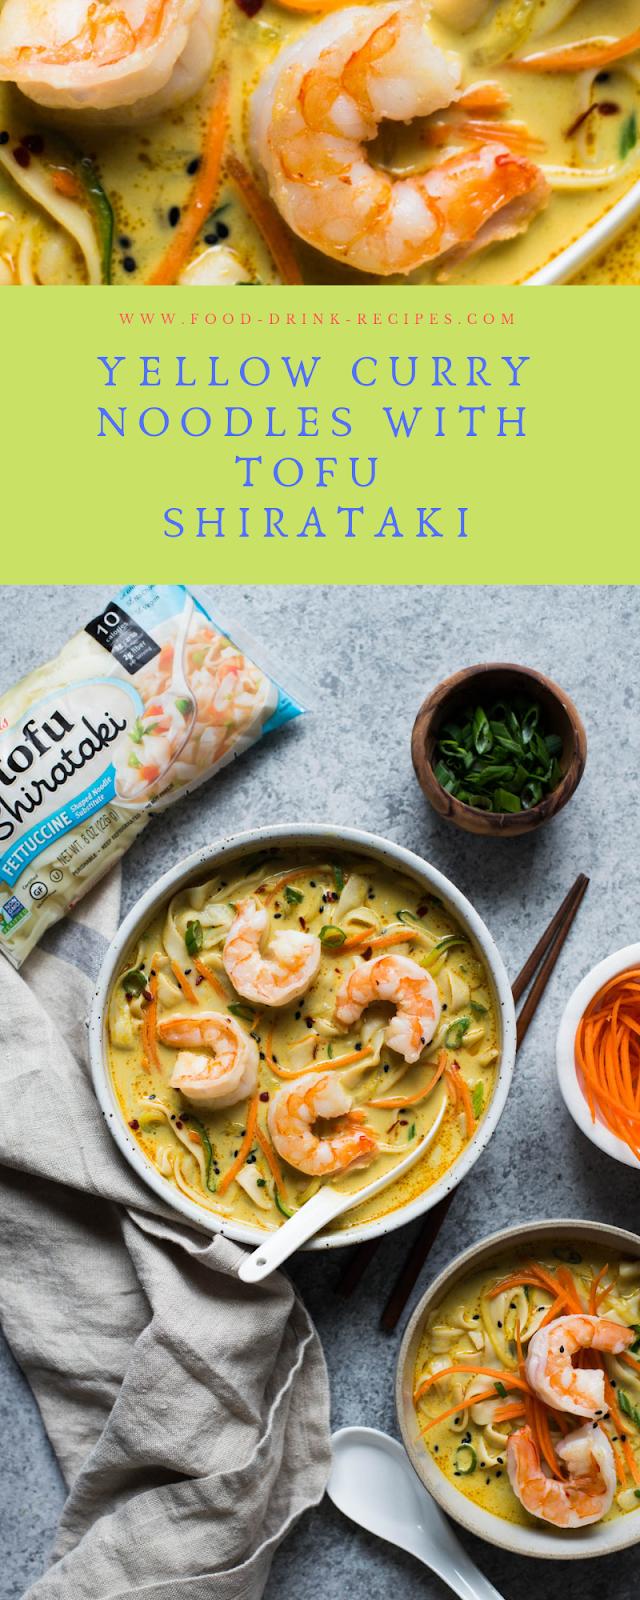 Yellow Curry Noodles with Tofu Shirataki